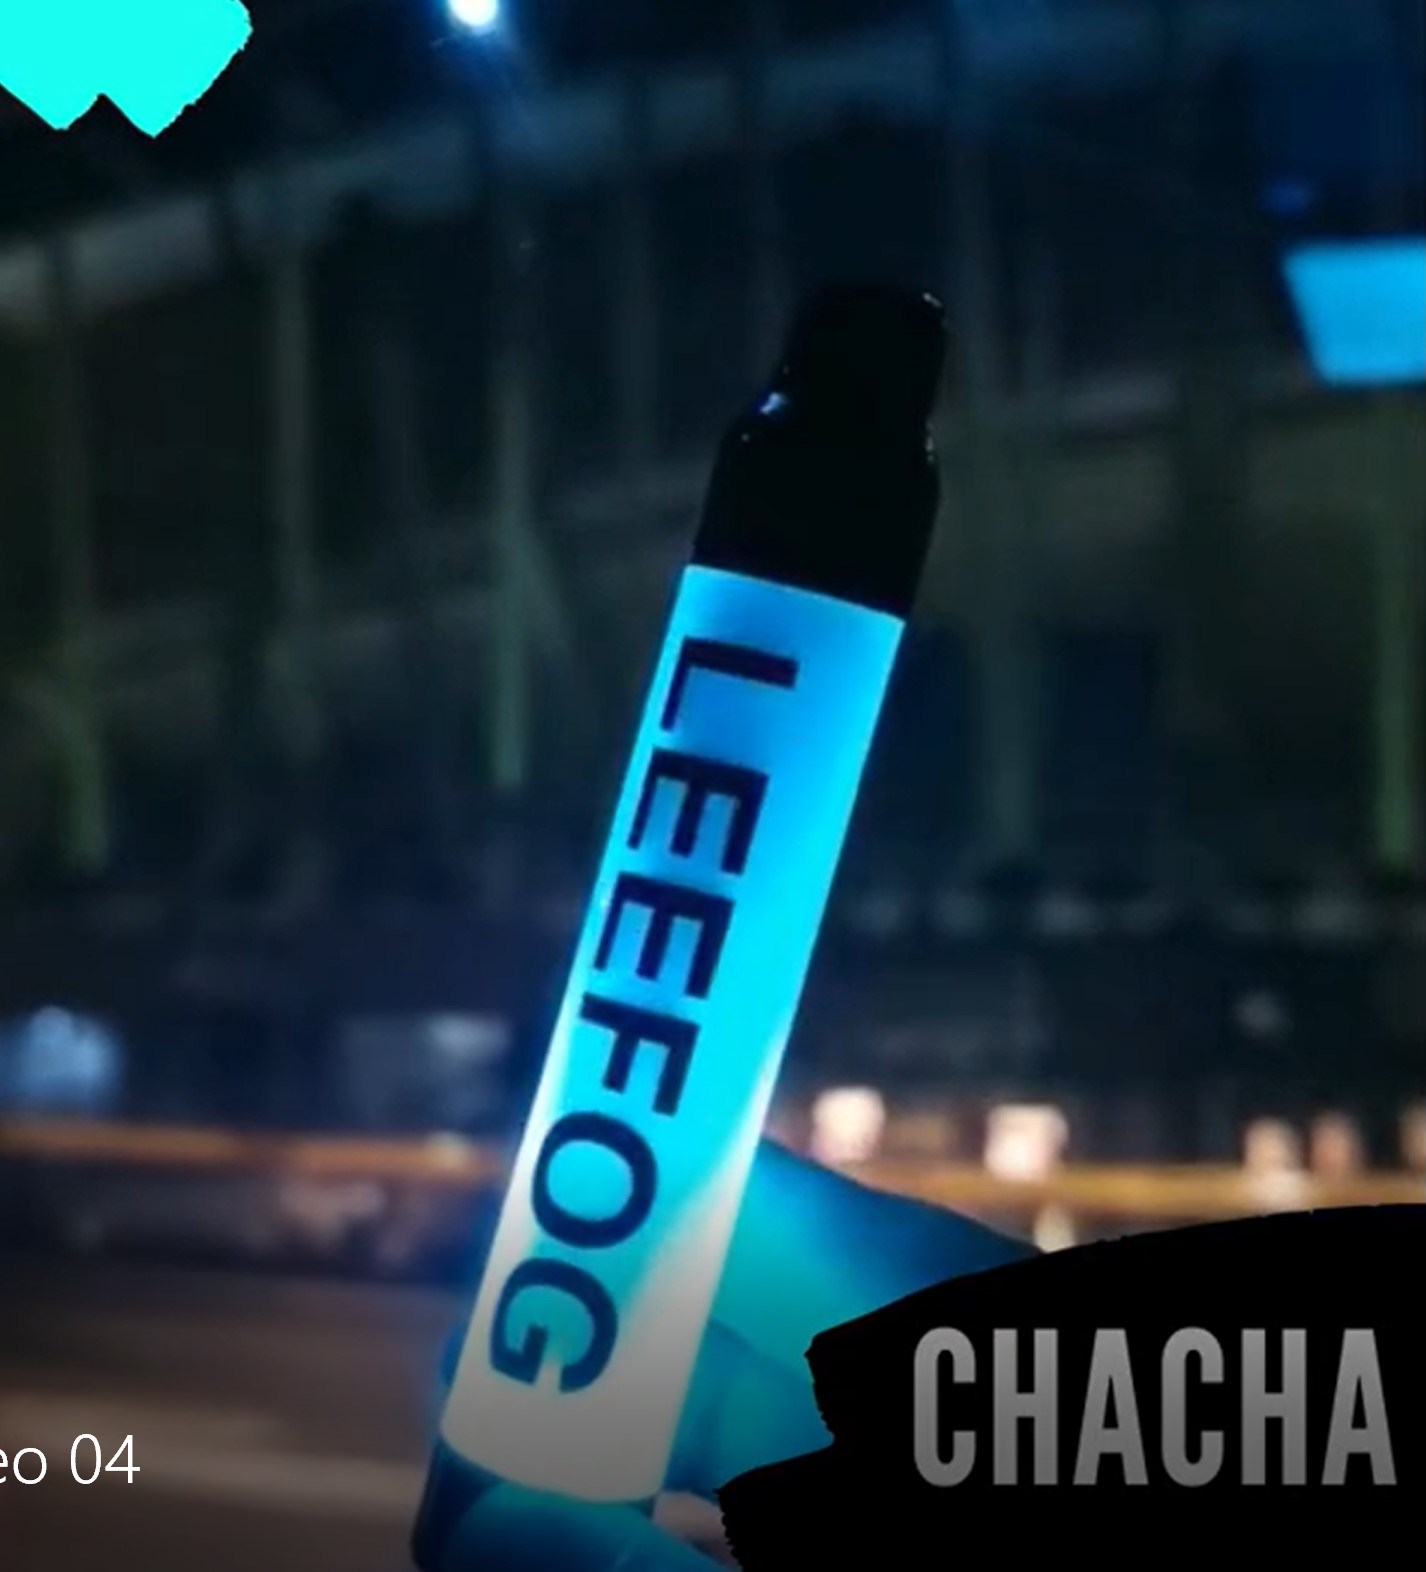 Leefog Chacha LED-Licht Leuchtende Glow wiederaufladbare E-Cig 2200 Puffs Elektronische Zigarette Cigarrillo Electronico ecig Großhandel E Zigarette Großhandel Vape